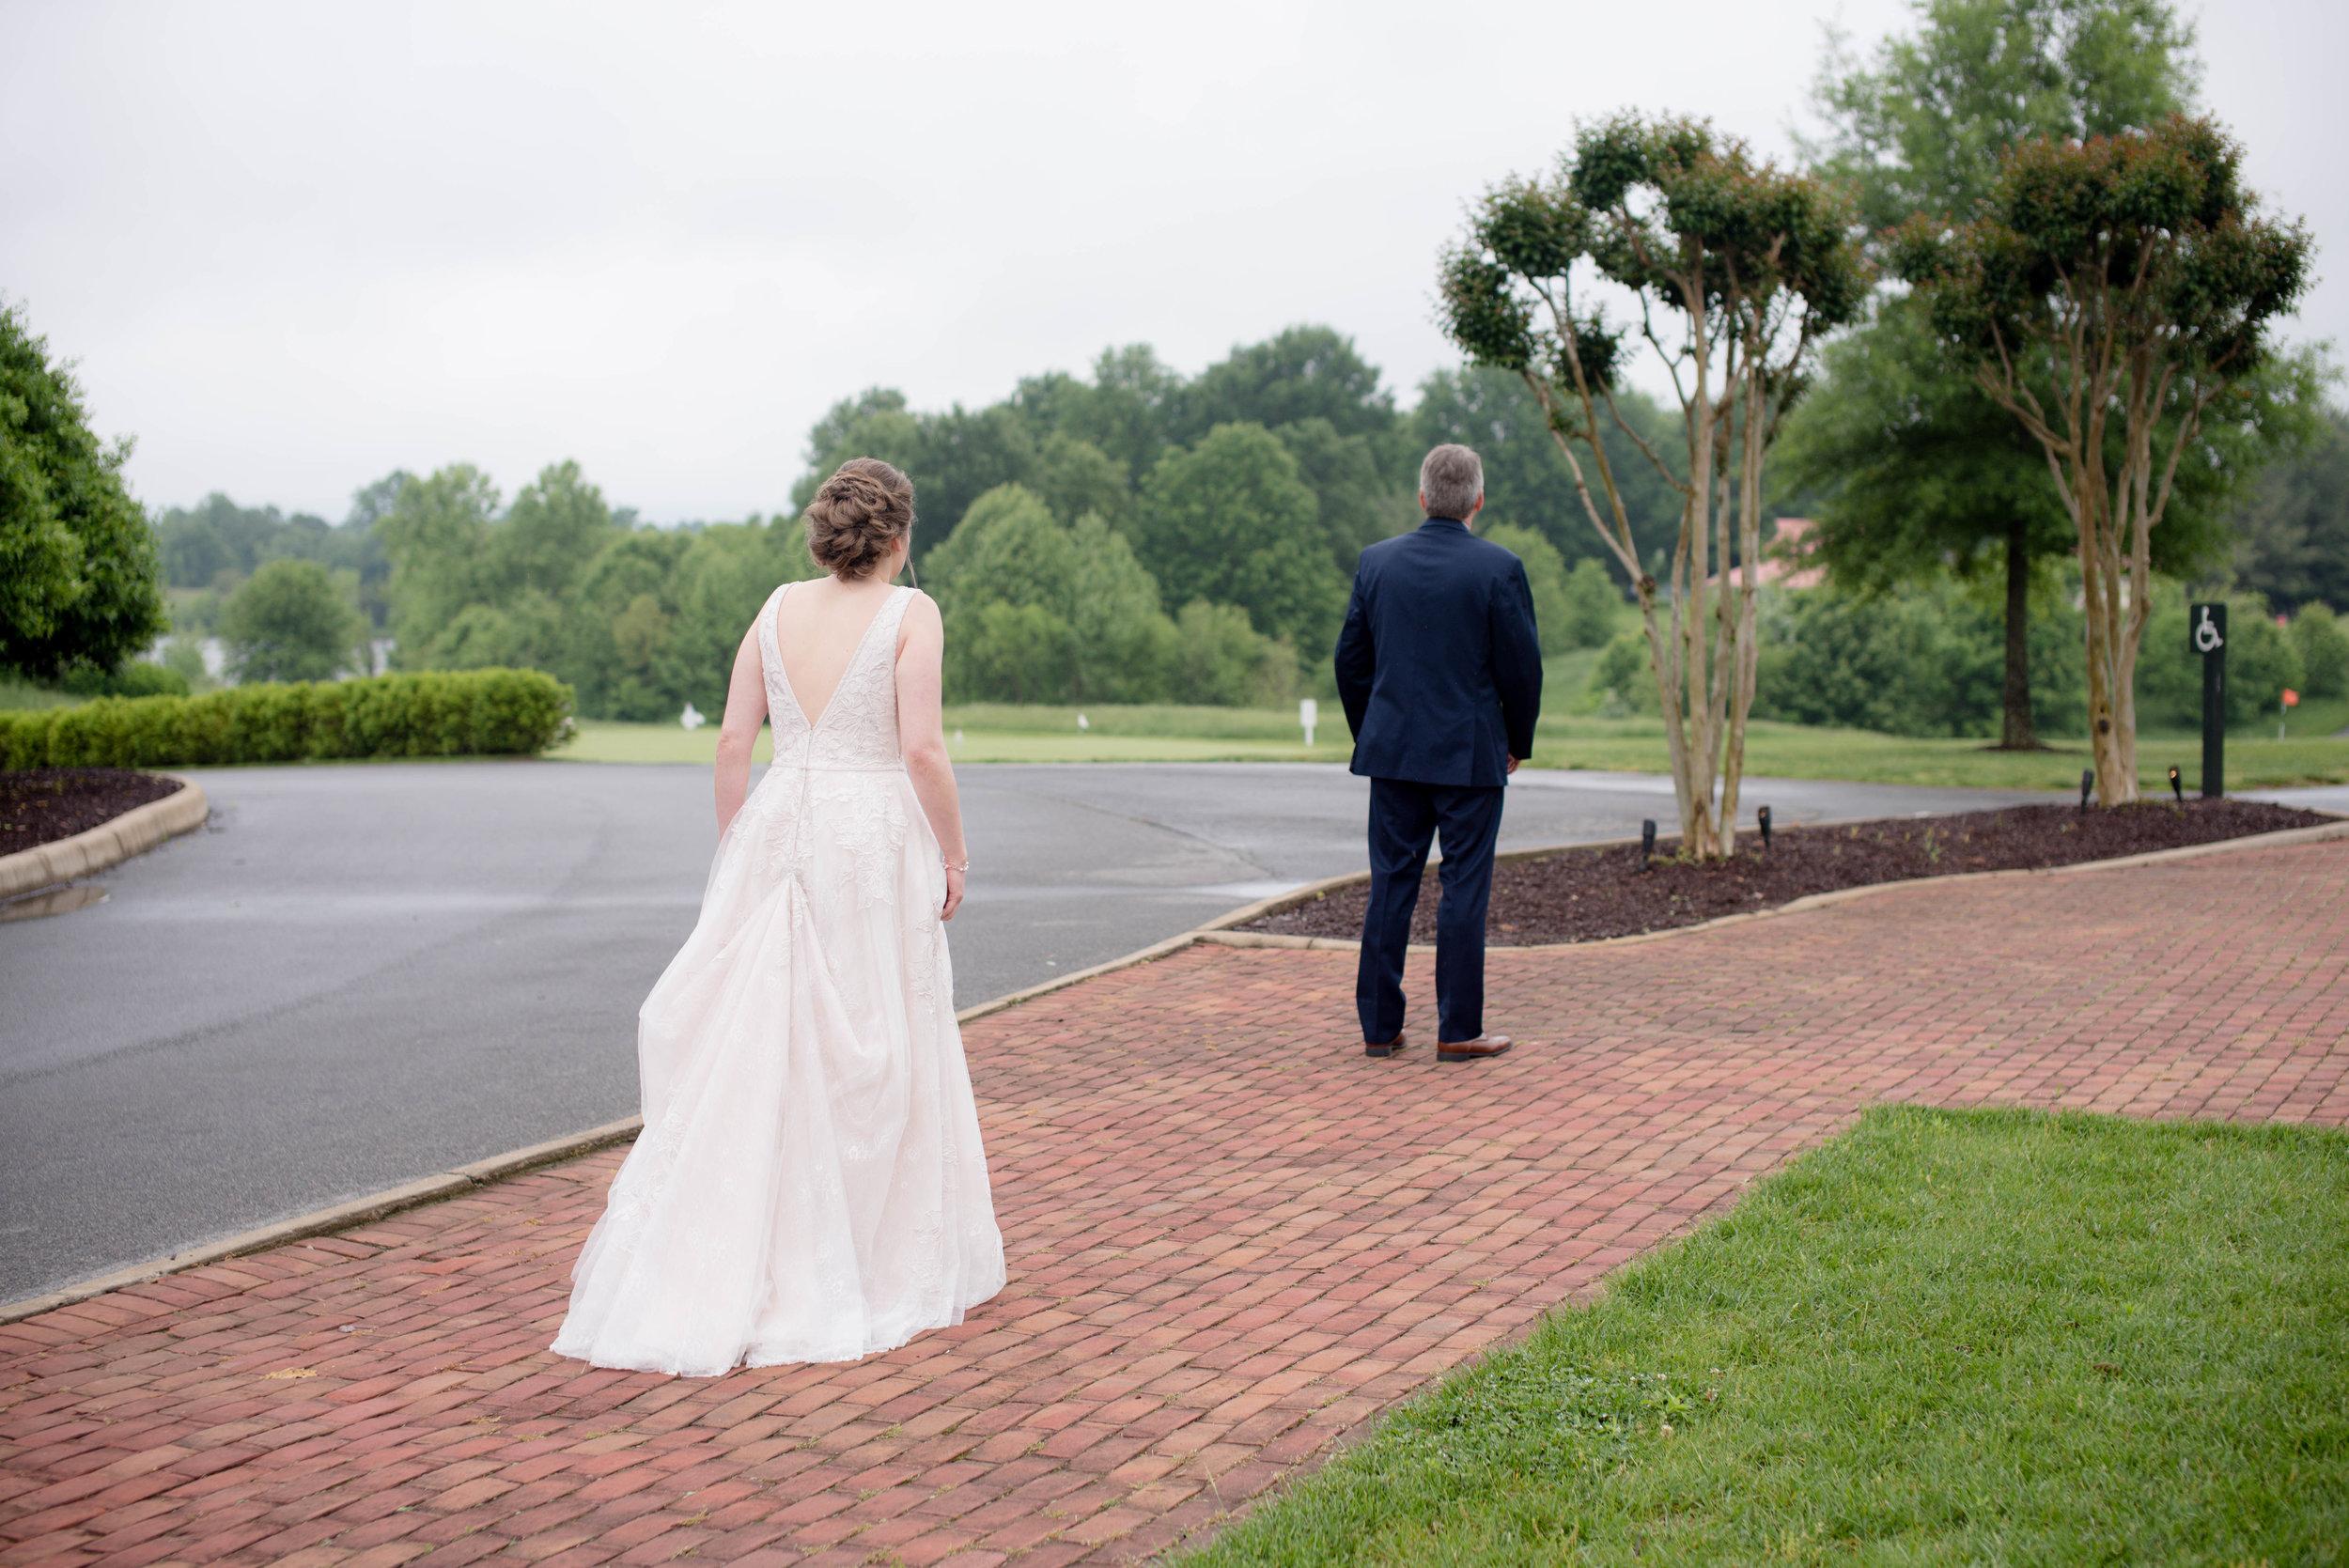 blue-ridge-wedding-ashley-nicole-photography-restoration-hall-crozetphotography-restorationhall-charlottesville-wedding_dadfirstlook-1.jpg